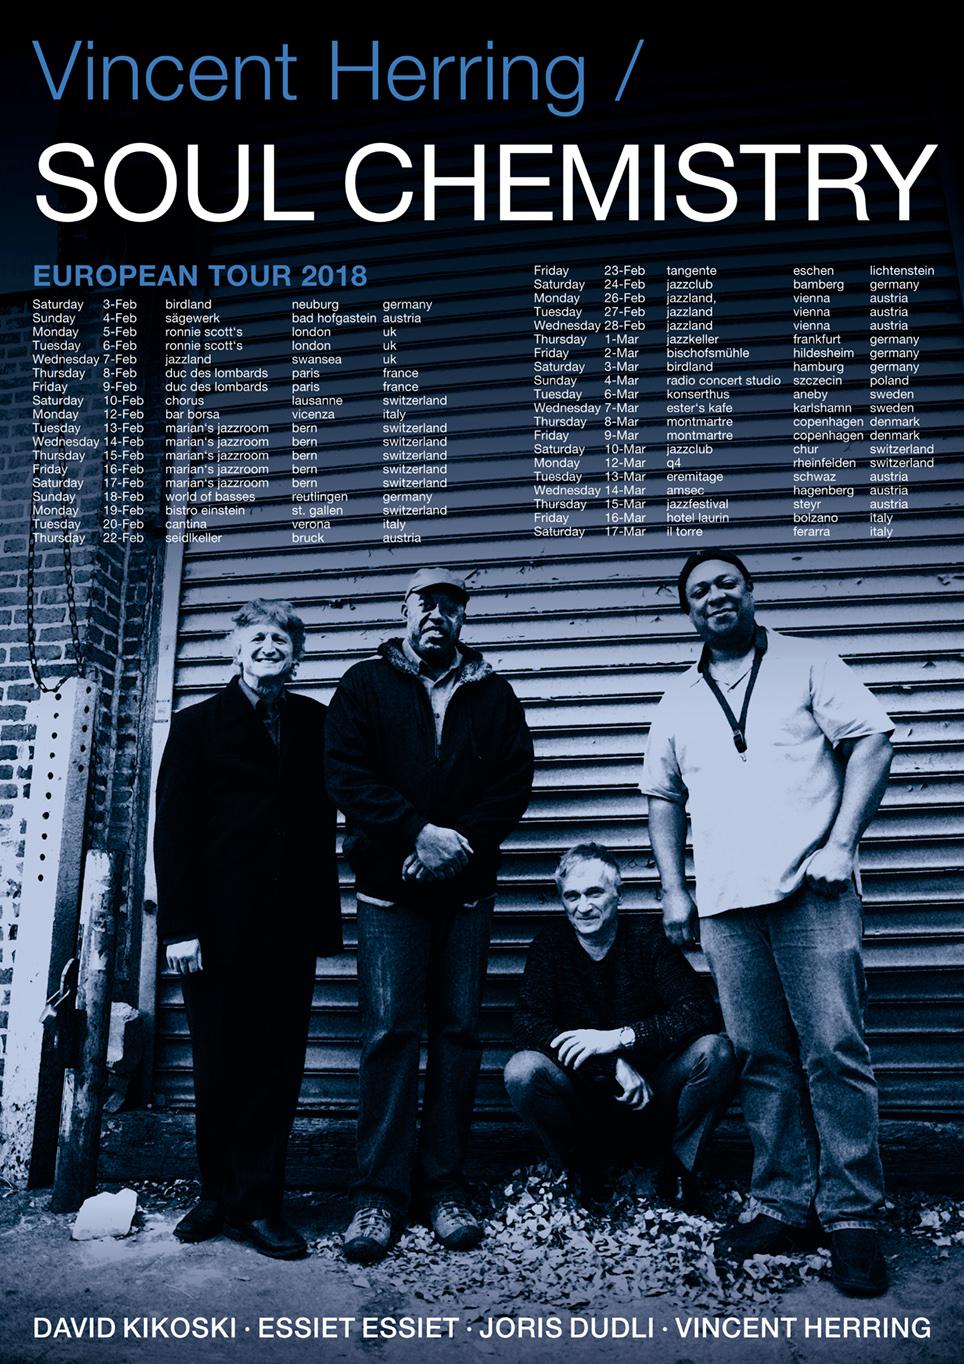 soulchemistry_web_tour_72dpi